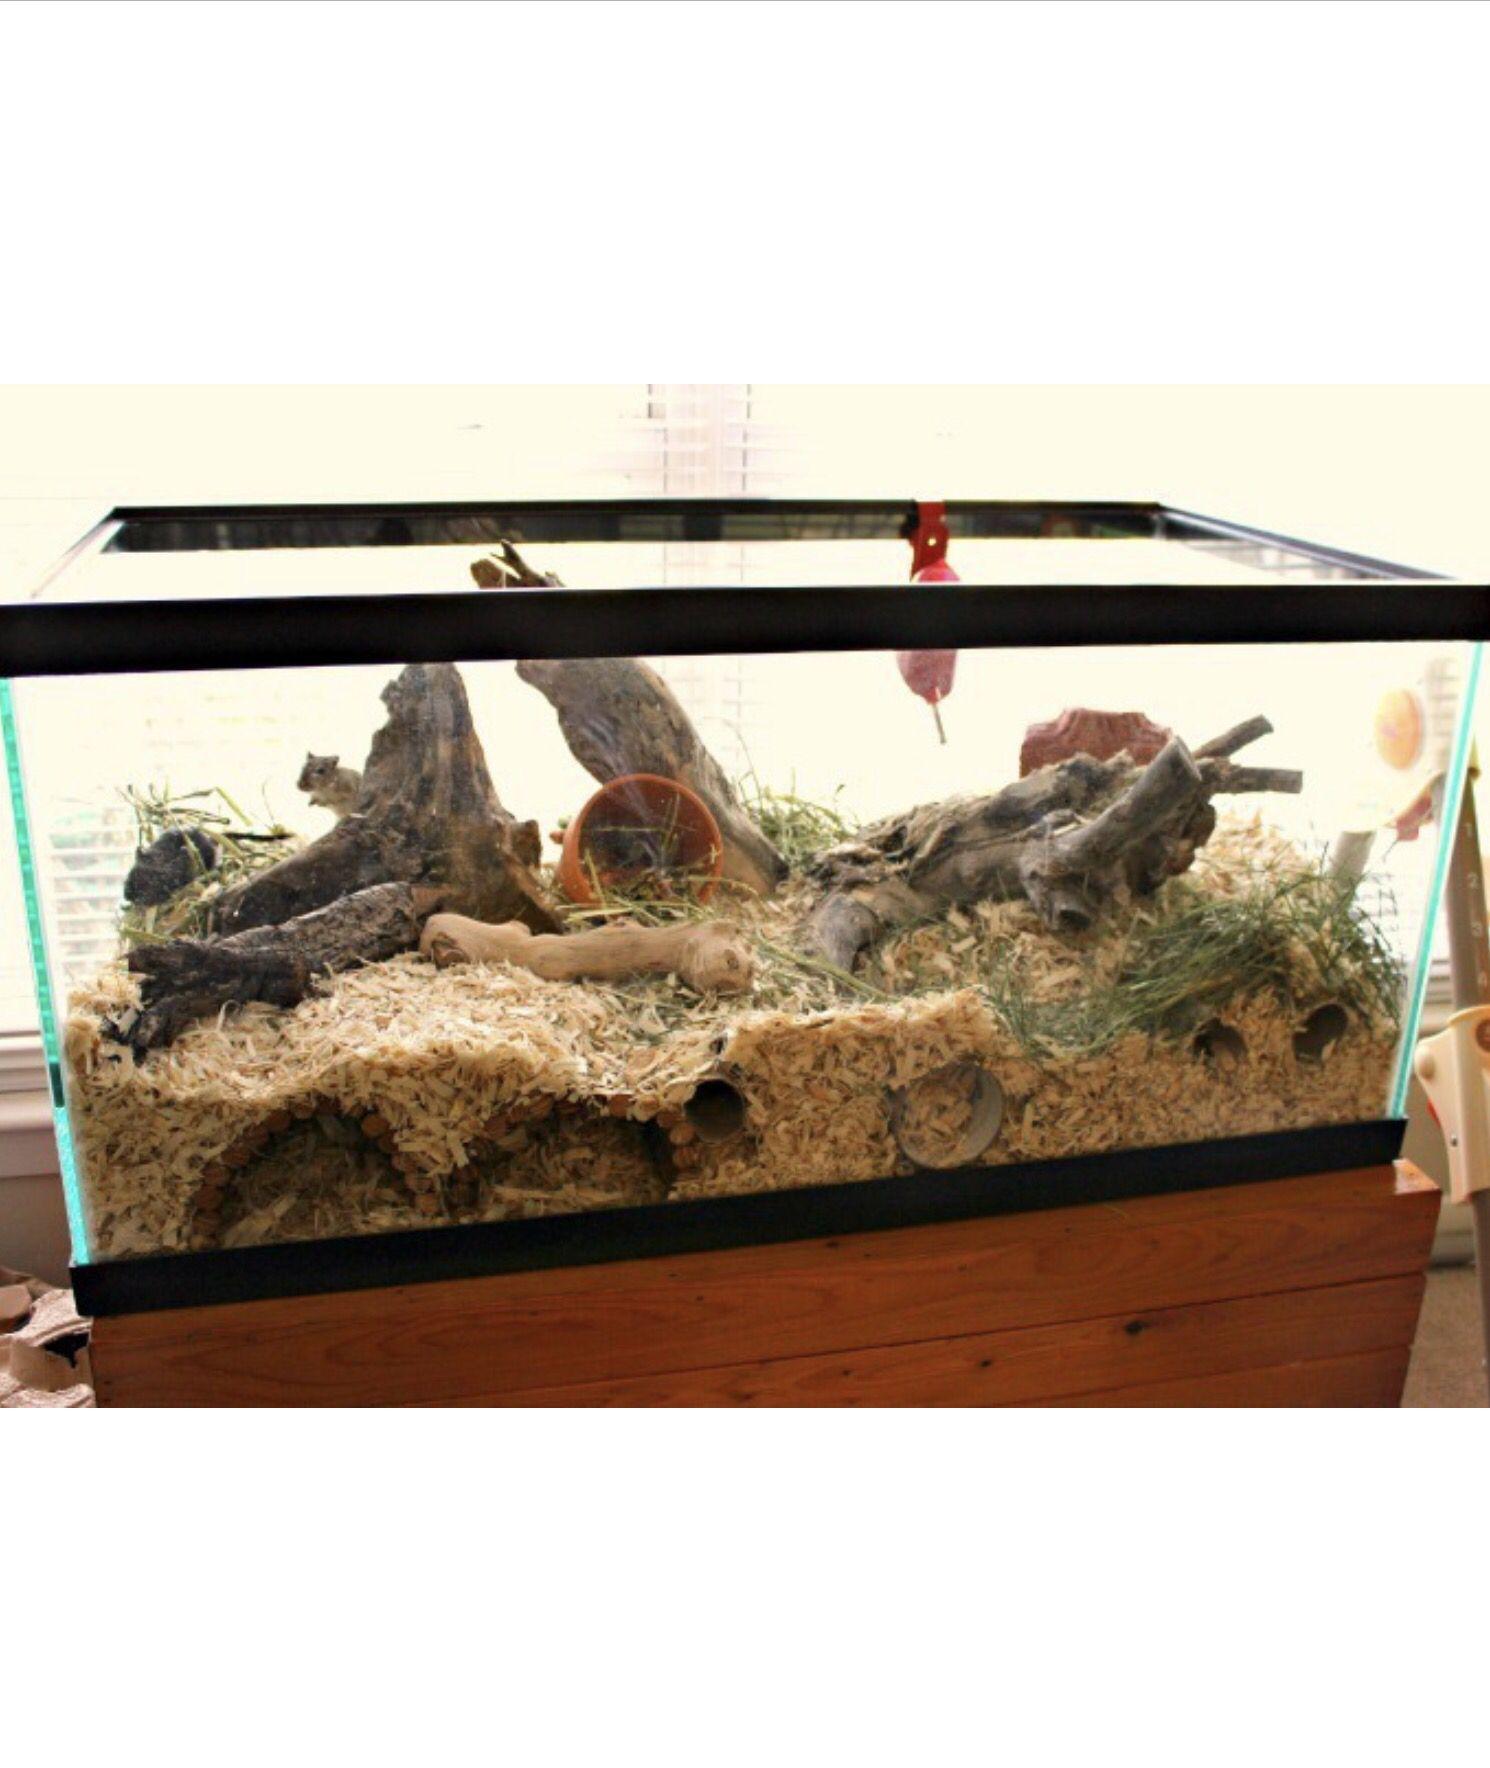 Large Gerbil Cage Tank Aquarium Zwerghamster Spielzeug Rennmaus